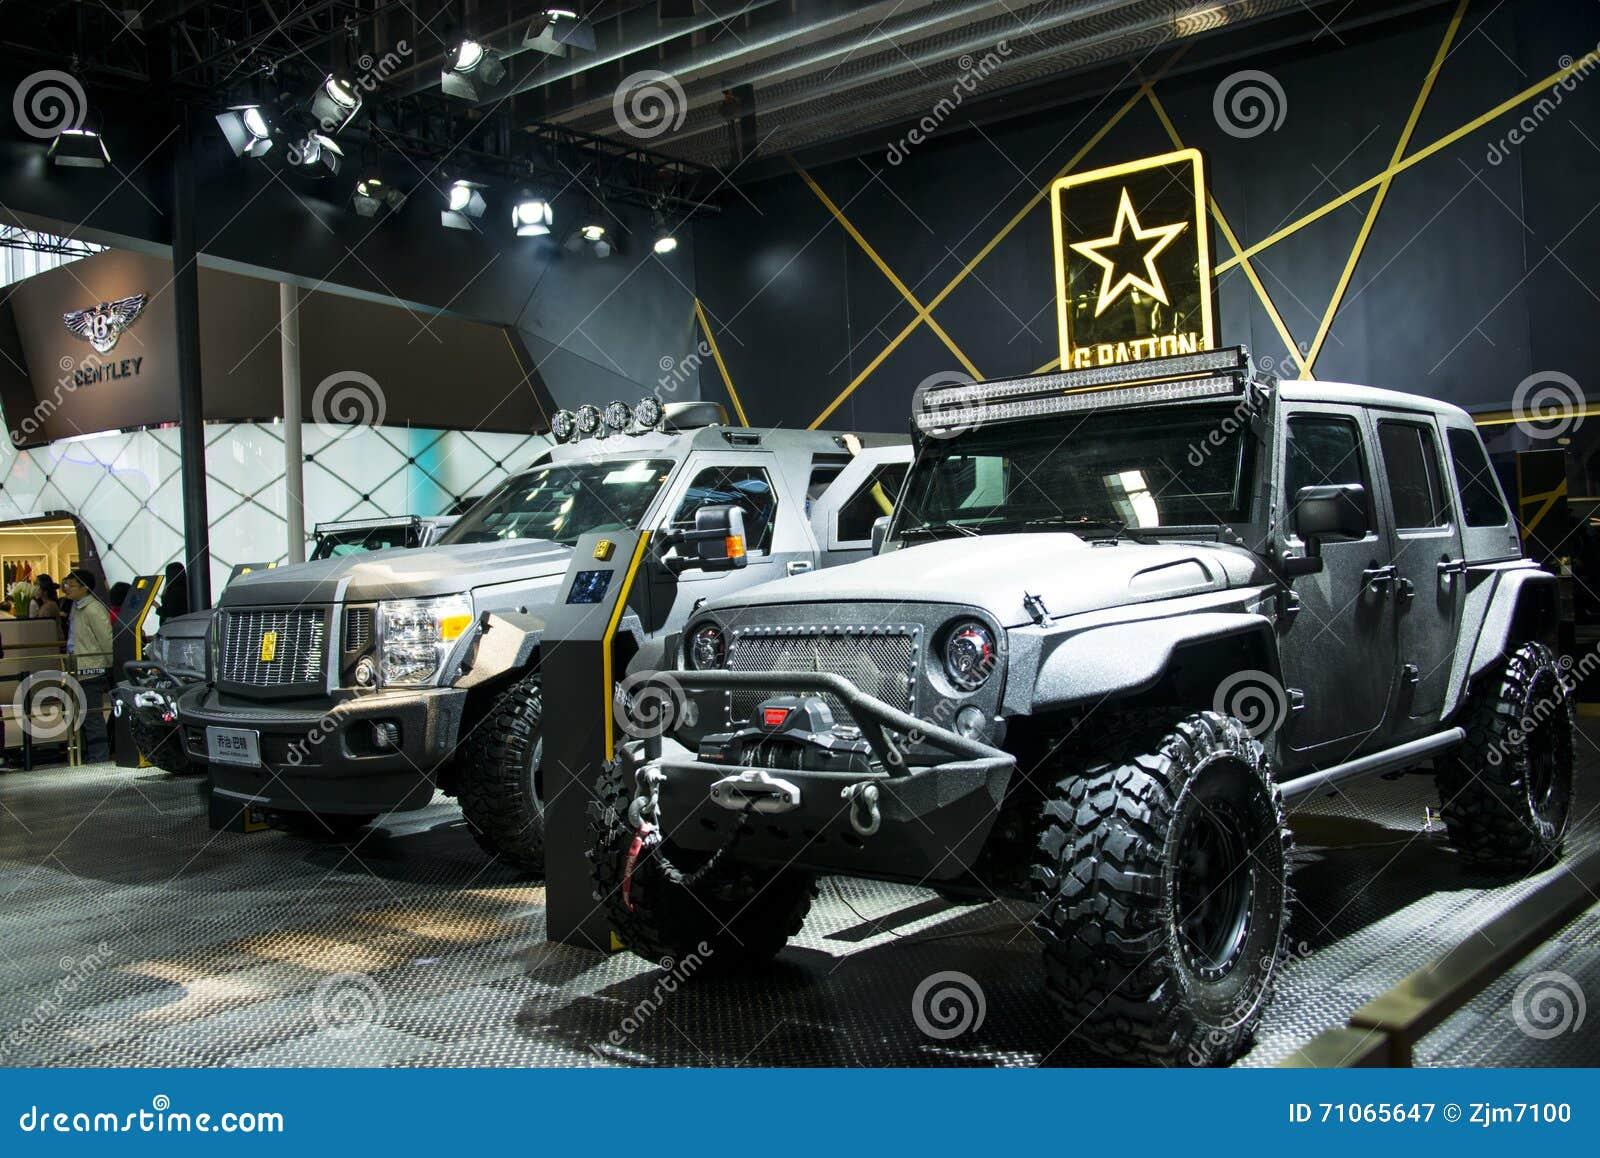 asia china beijing 2016 international automobile exhibition indoor exhibition hall off road. Black Bedroom Furniture Sets. Home Design Ideas